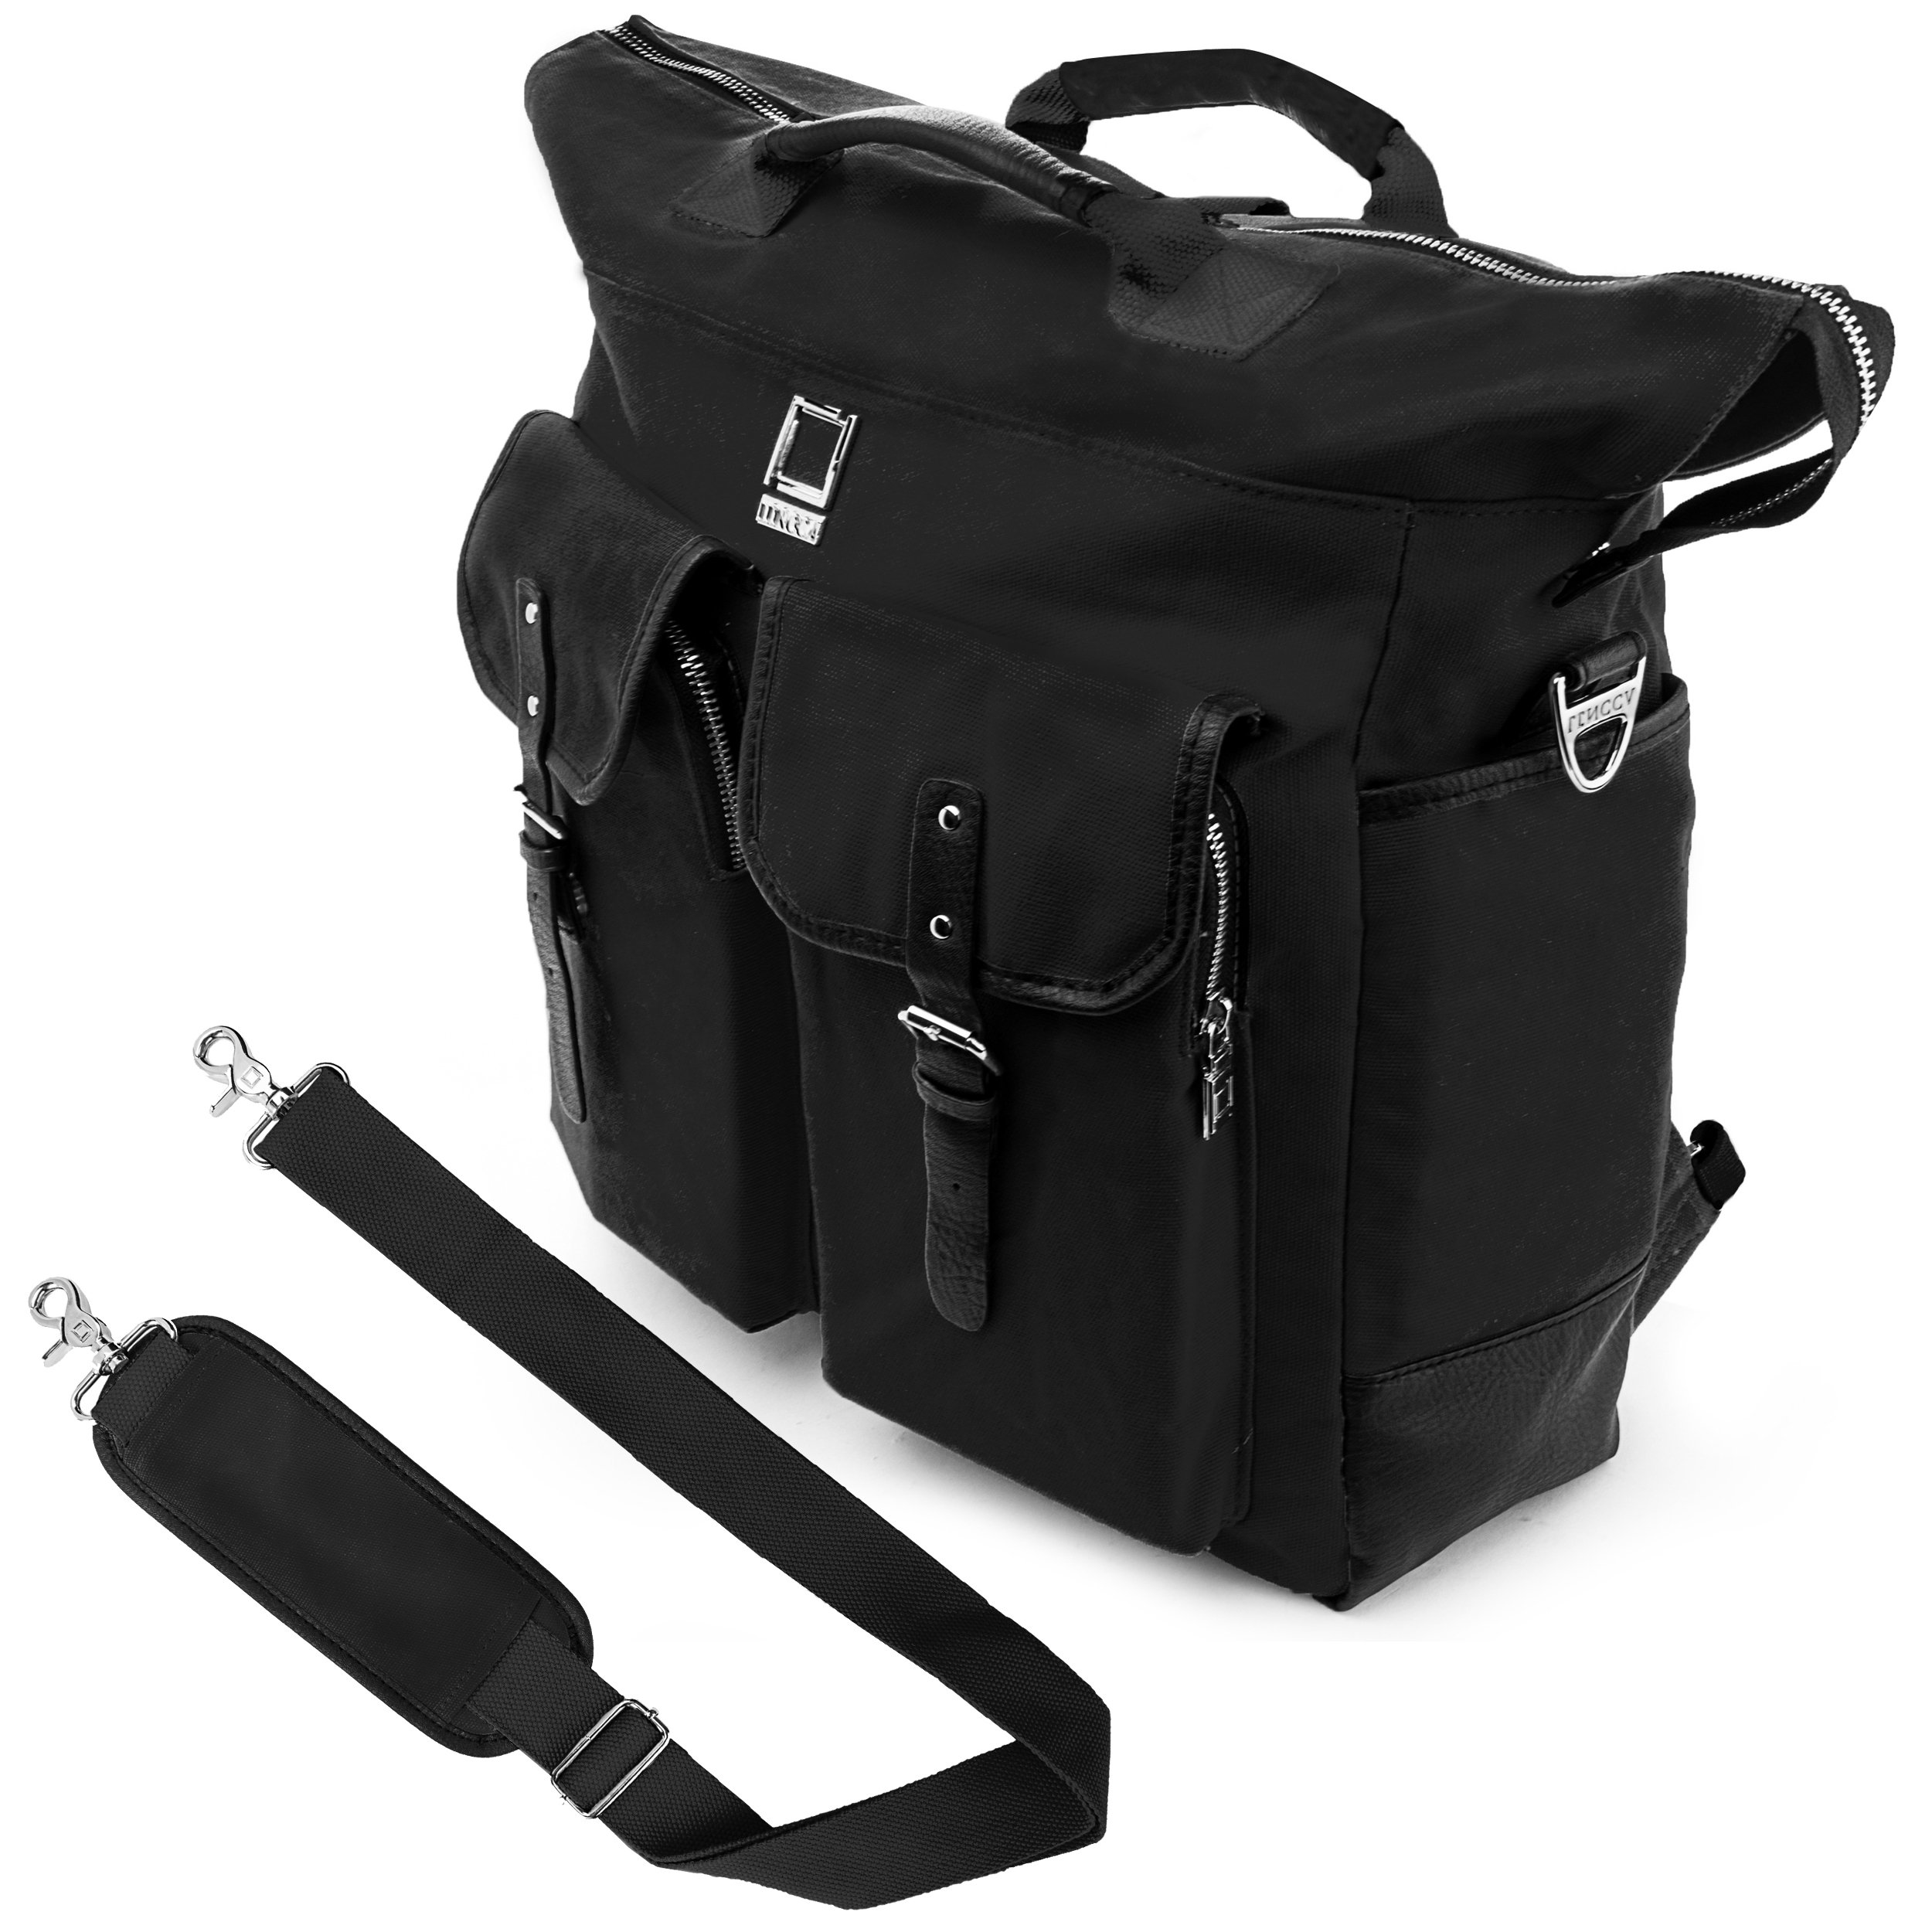 Lencca Universal Hybrid 3 in 1Design Carrying / Tote / Messenger / Crossbody / Backpack / Shoulder Bag for Apple Macbook Pro series 15.4 / 13.3 inch Mac OS X Laptop (Black)